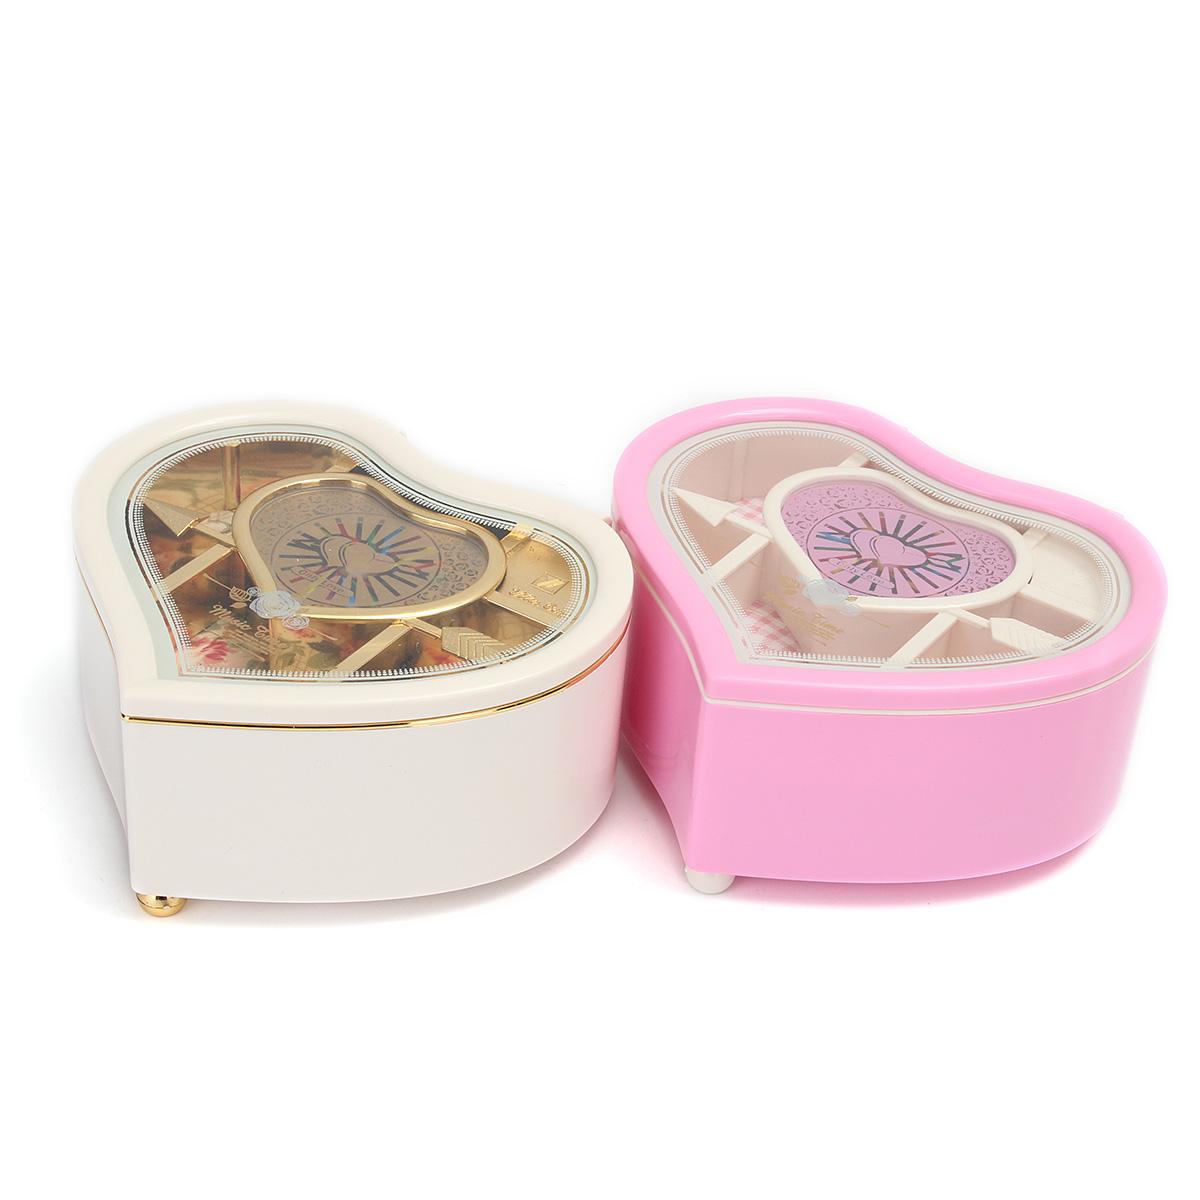 Kid Heart Shaped Jewellery Music Box Ballerina Xmas Toy Gift Home Decor